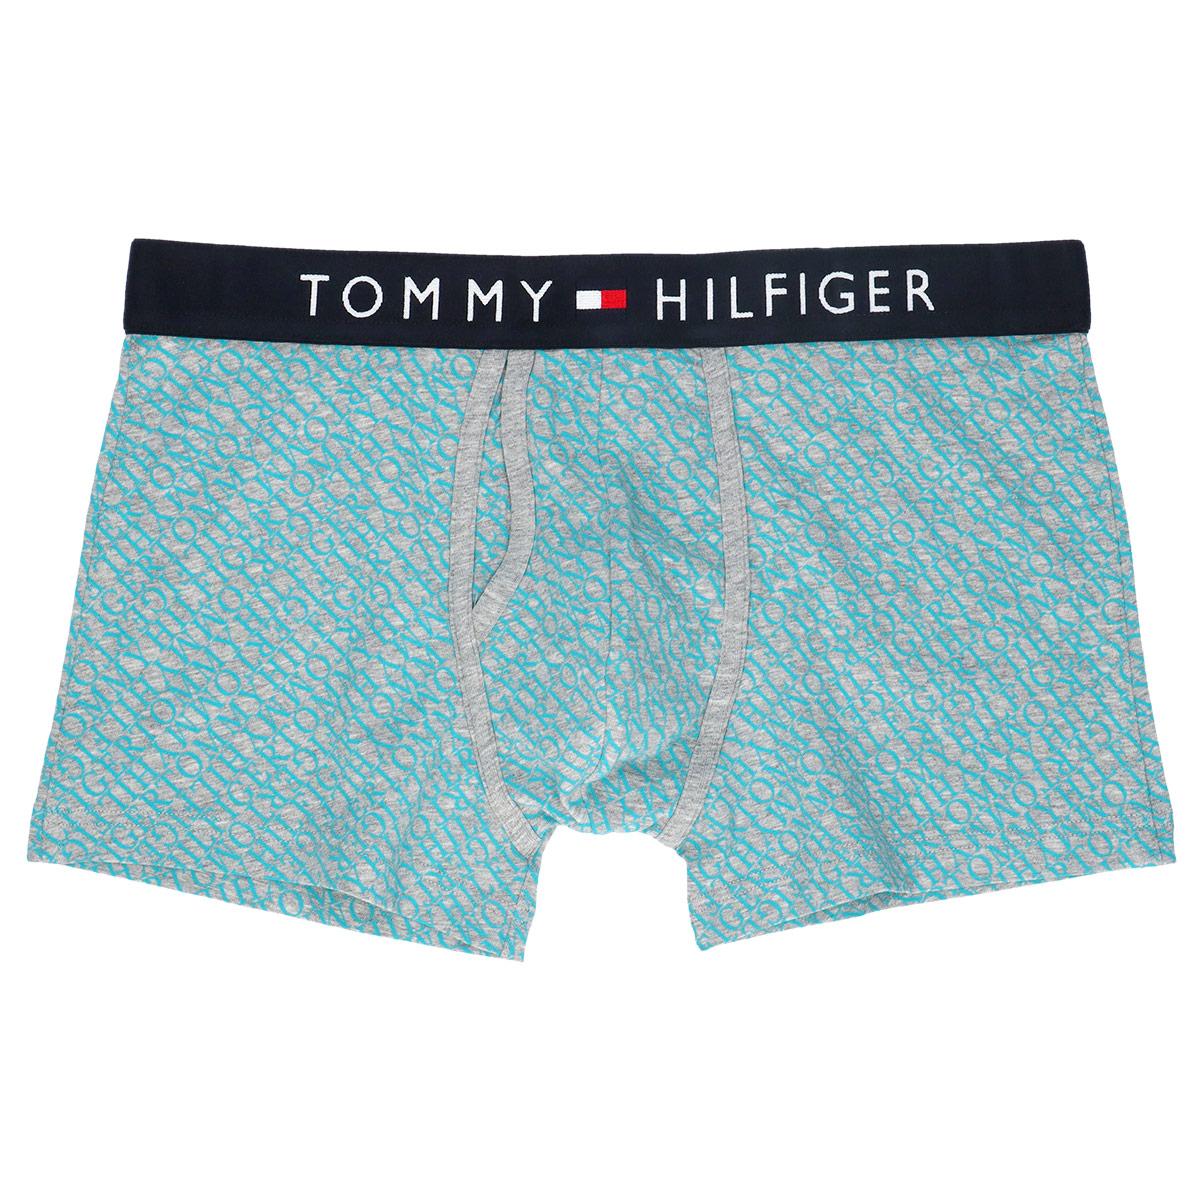 TOMMY HILFIGER|トミーヒルフィガー TOMMY COTTON KEYHOLE TRUNK PRINT トミー コットン キーホール ボクサーパンツ 男性 メンズ 53302018【ゆうパケット・2点まで】